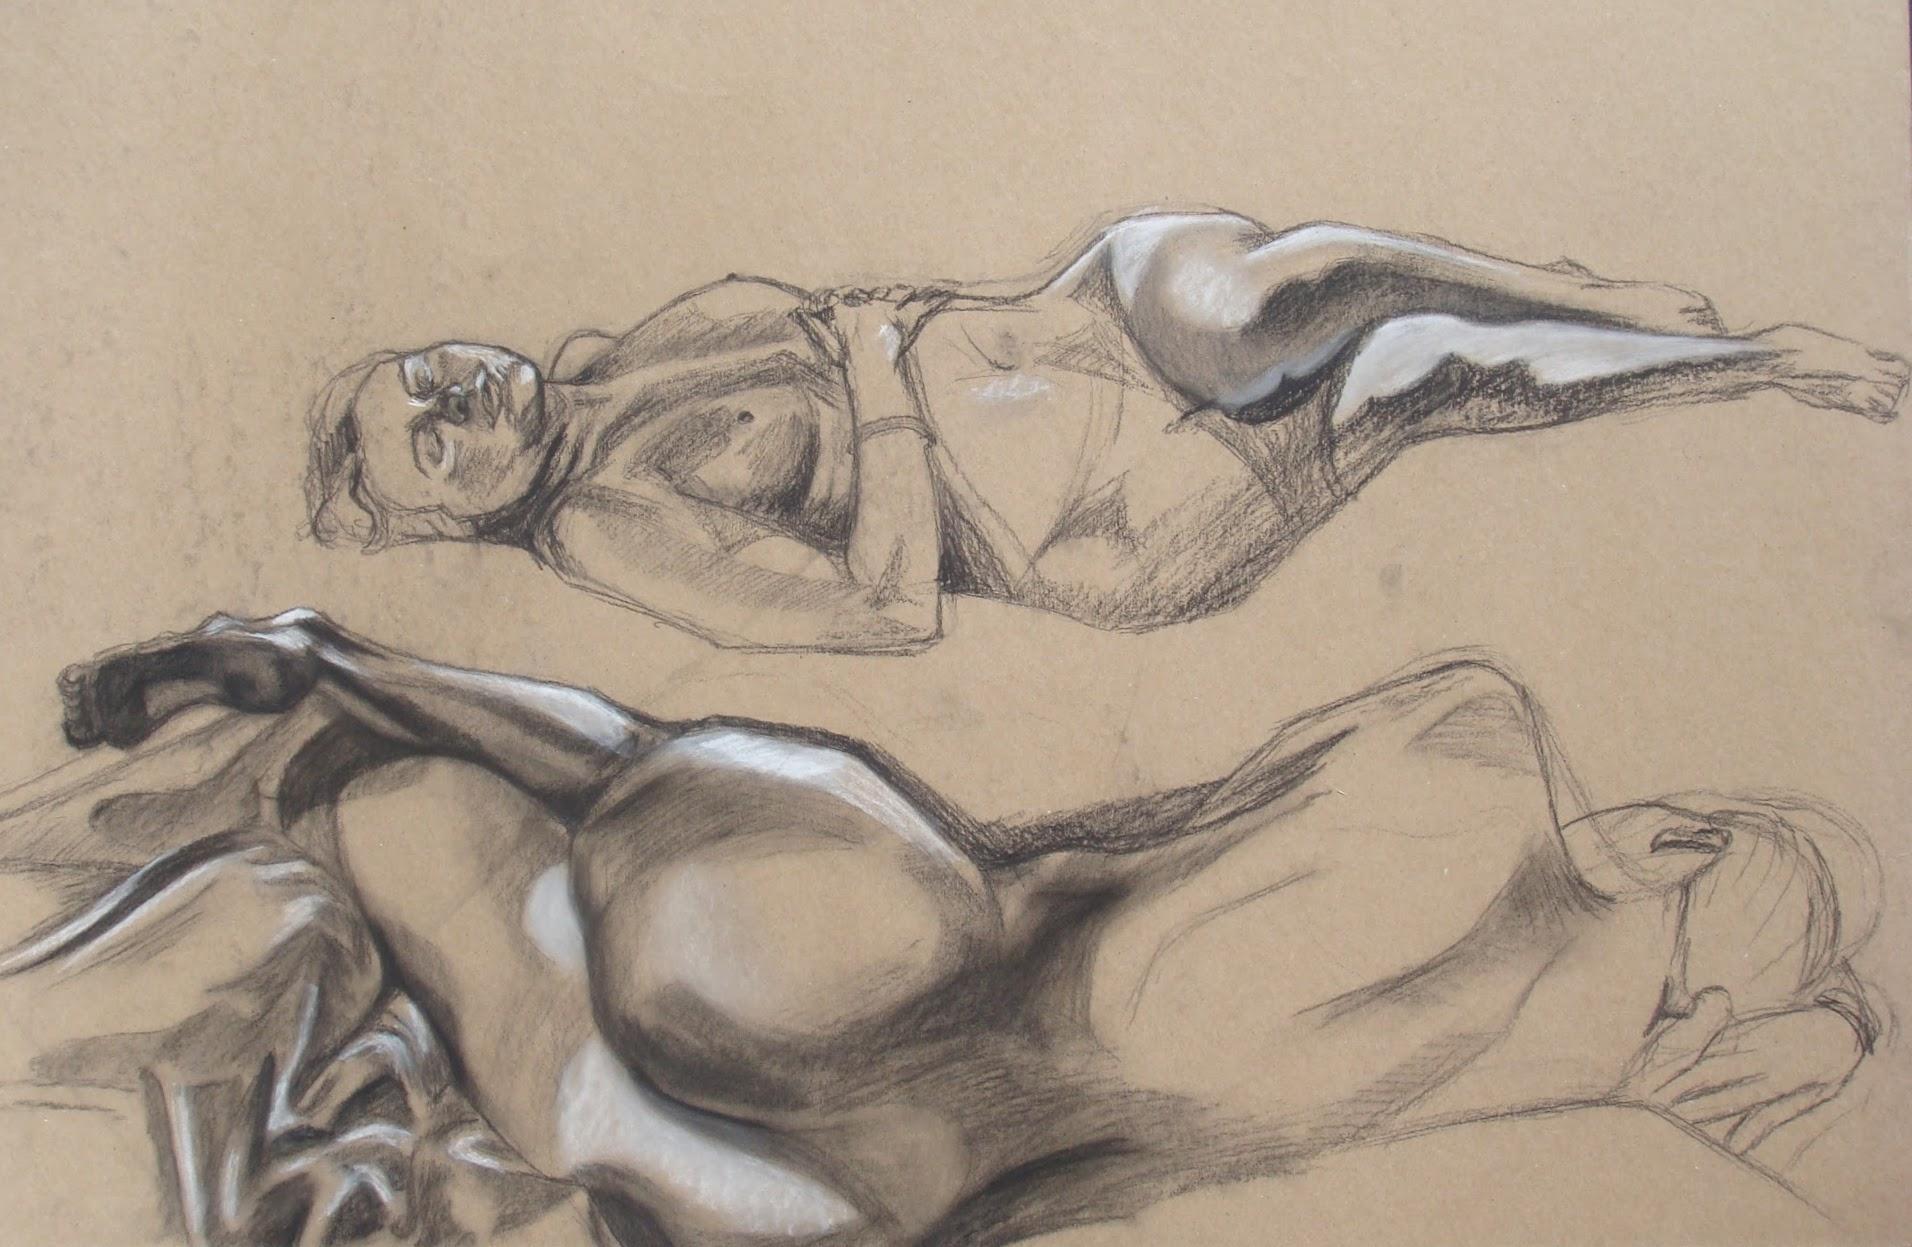 Life Drawing, 2009 conté crayon on cardboard